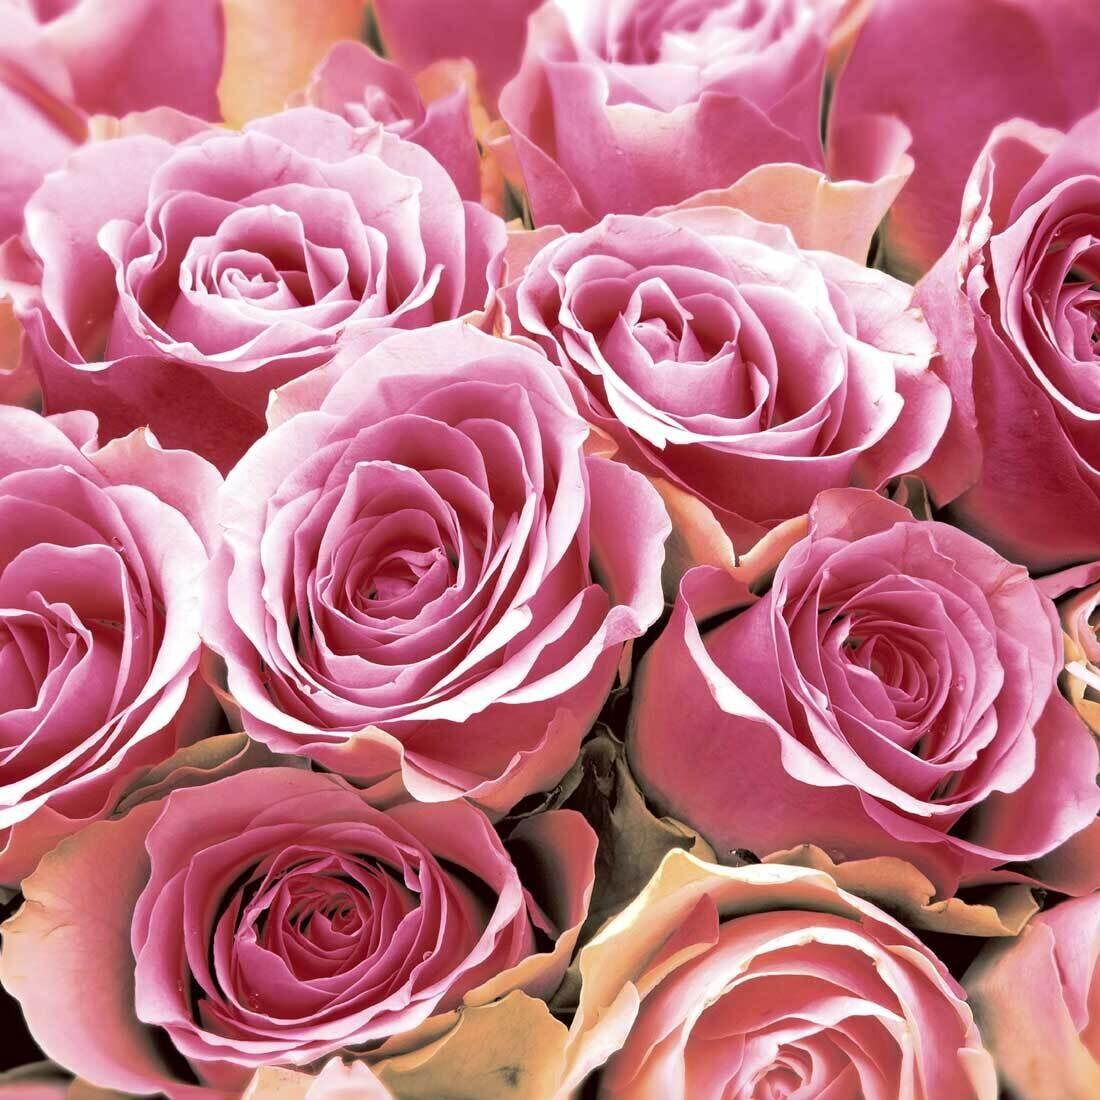 Decoupage Paper Napkins - Floral - Pink Roses (1 Sheet)